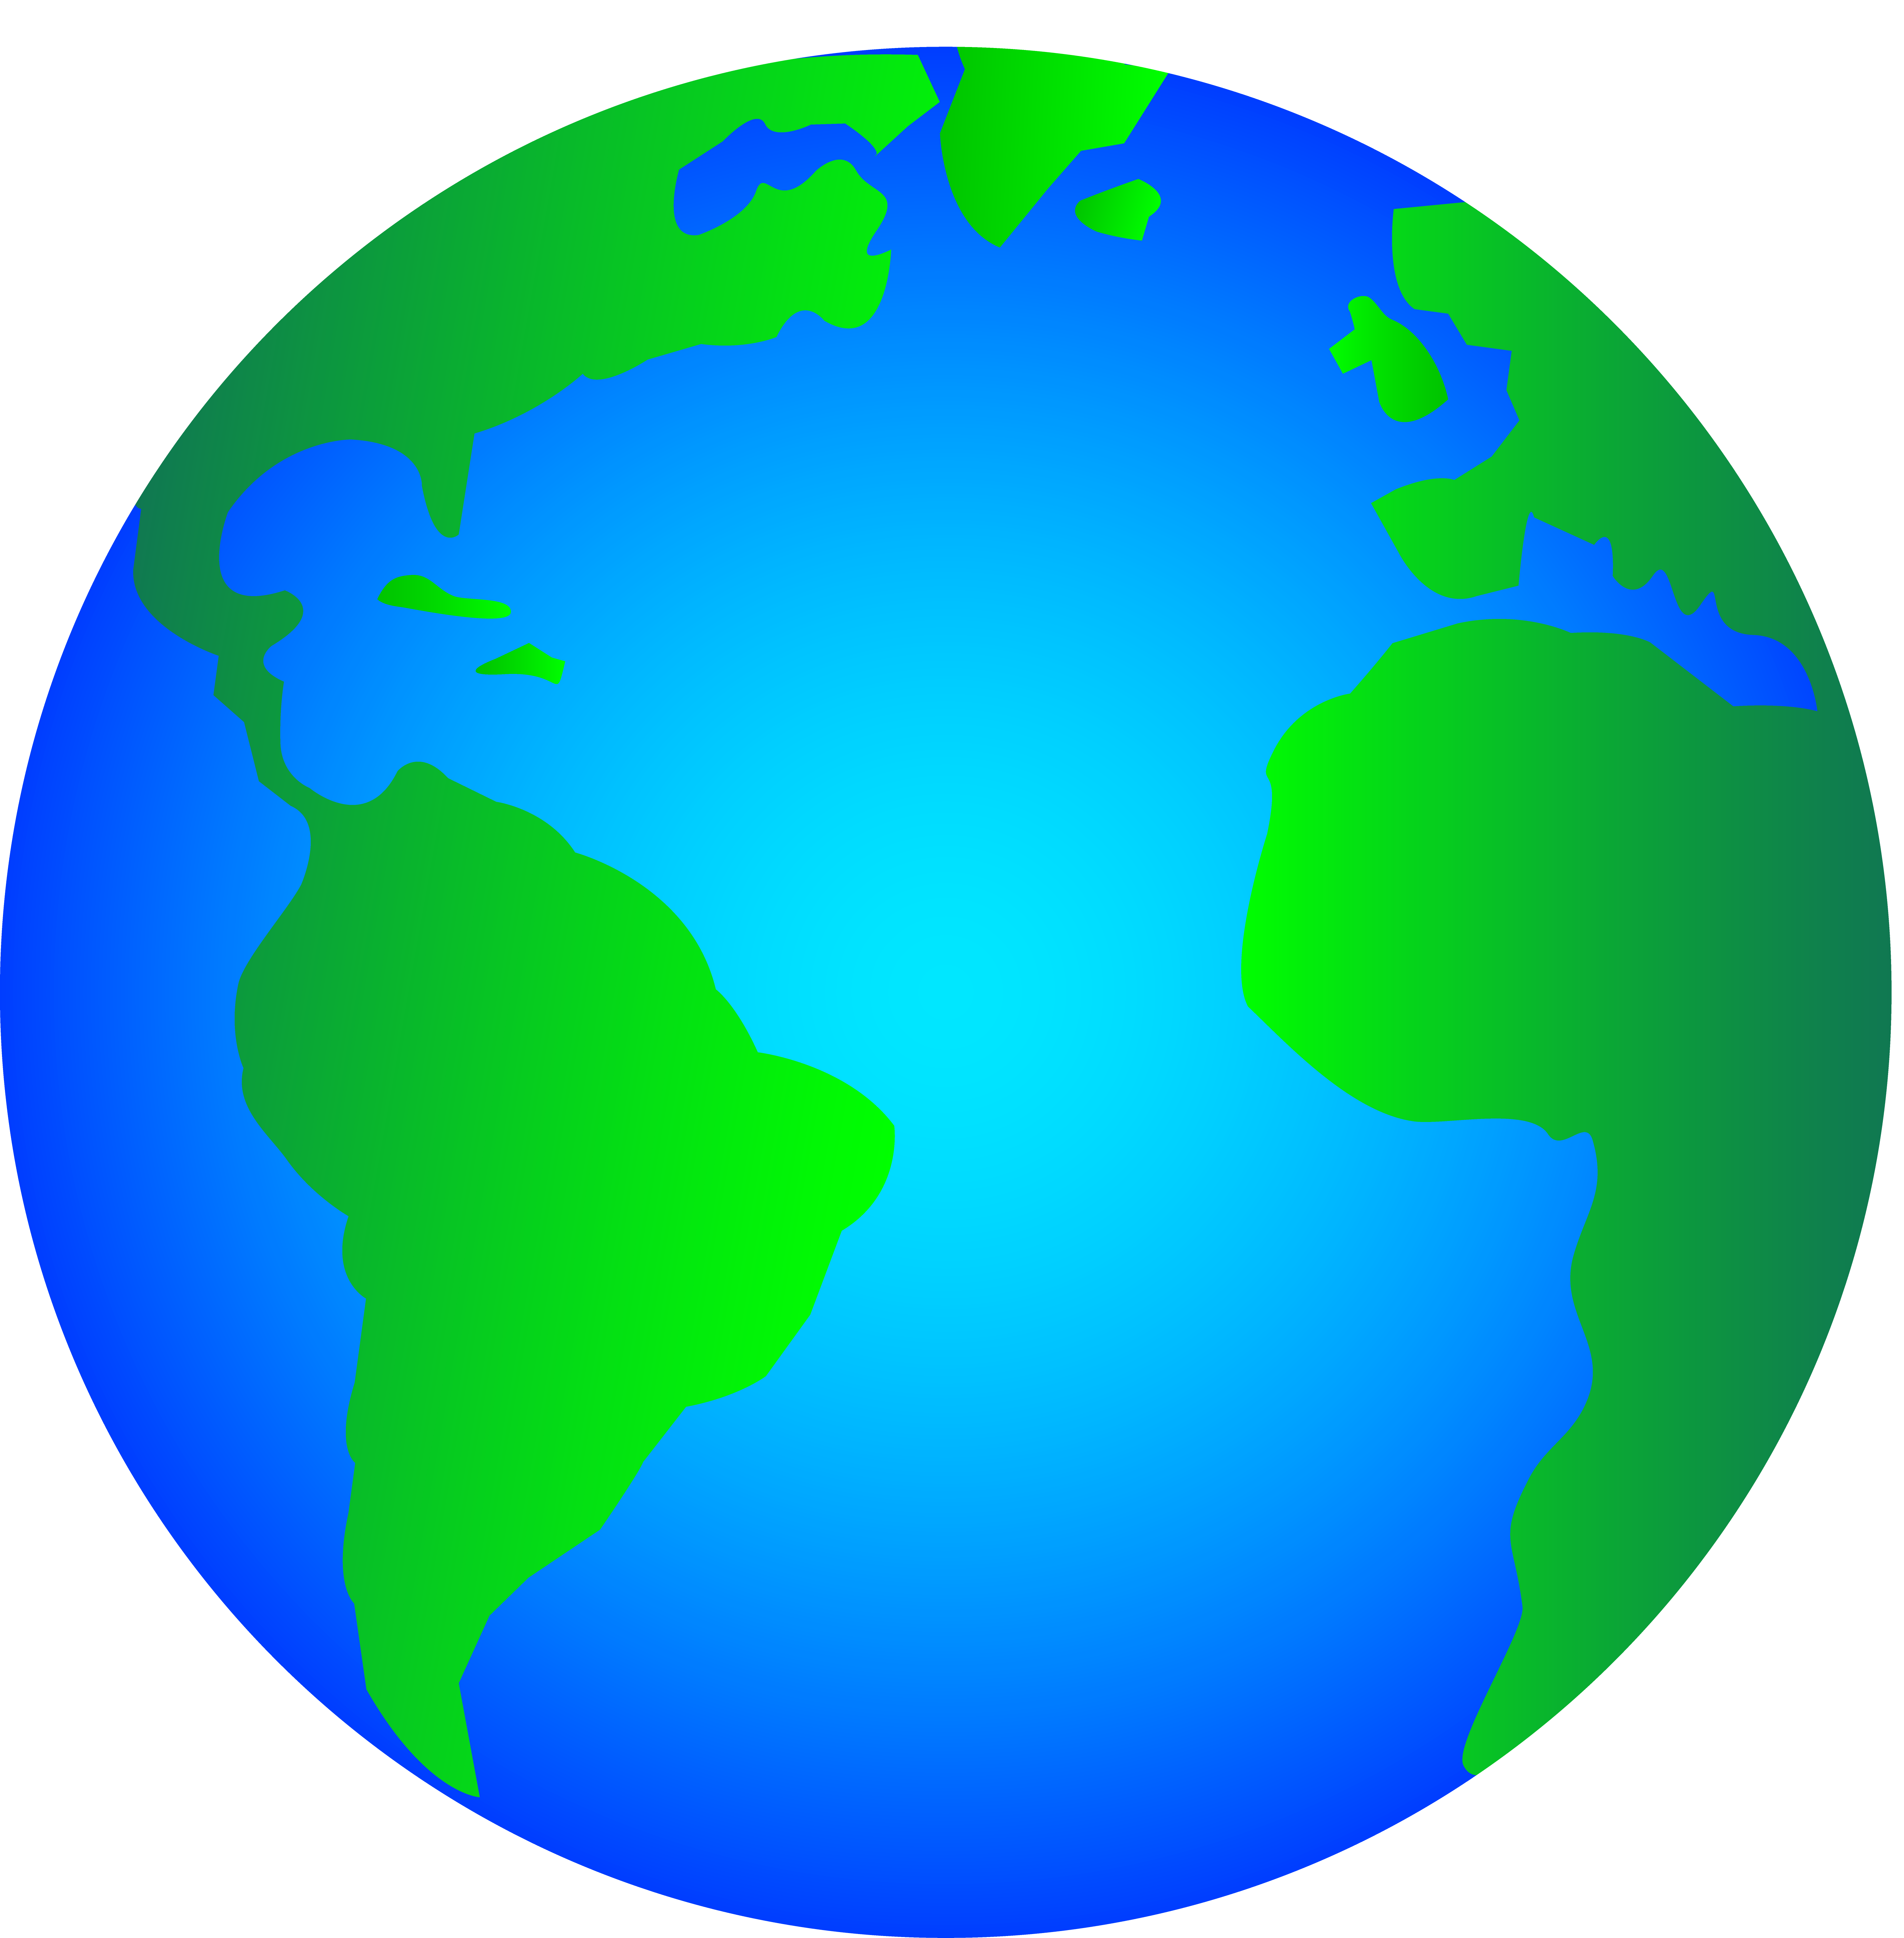 5748x5852 Planet Earth Shiny Logo